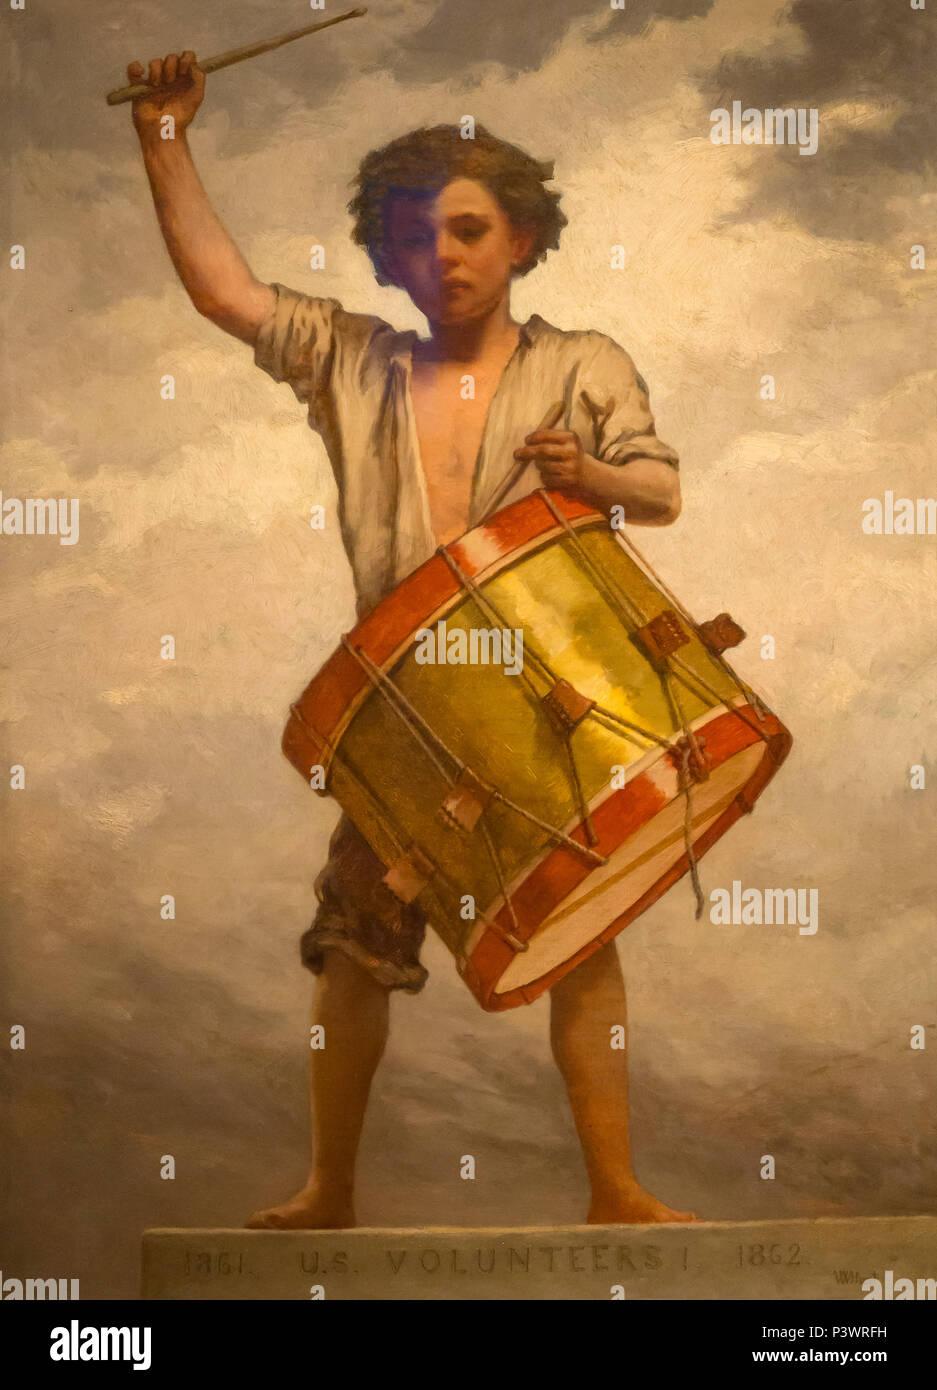 the drummer boy of shiloh poem